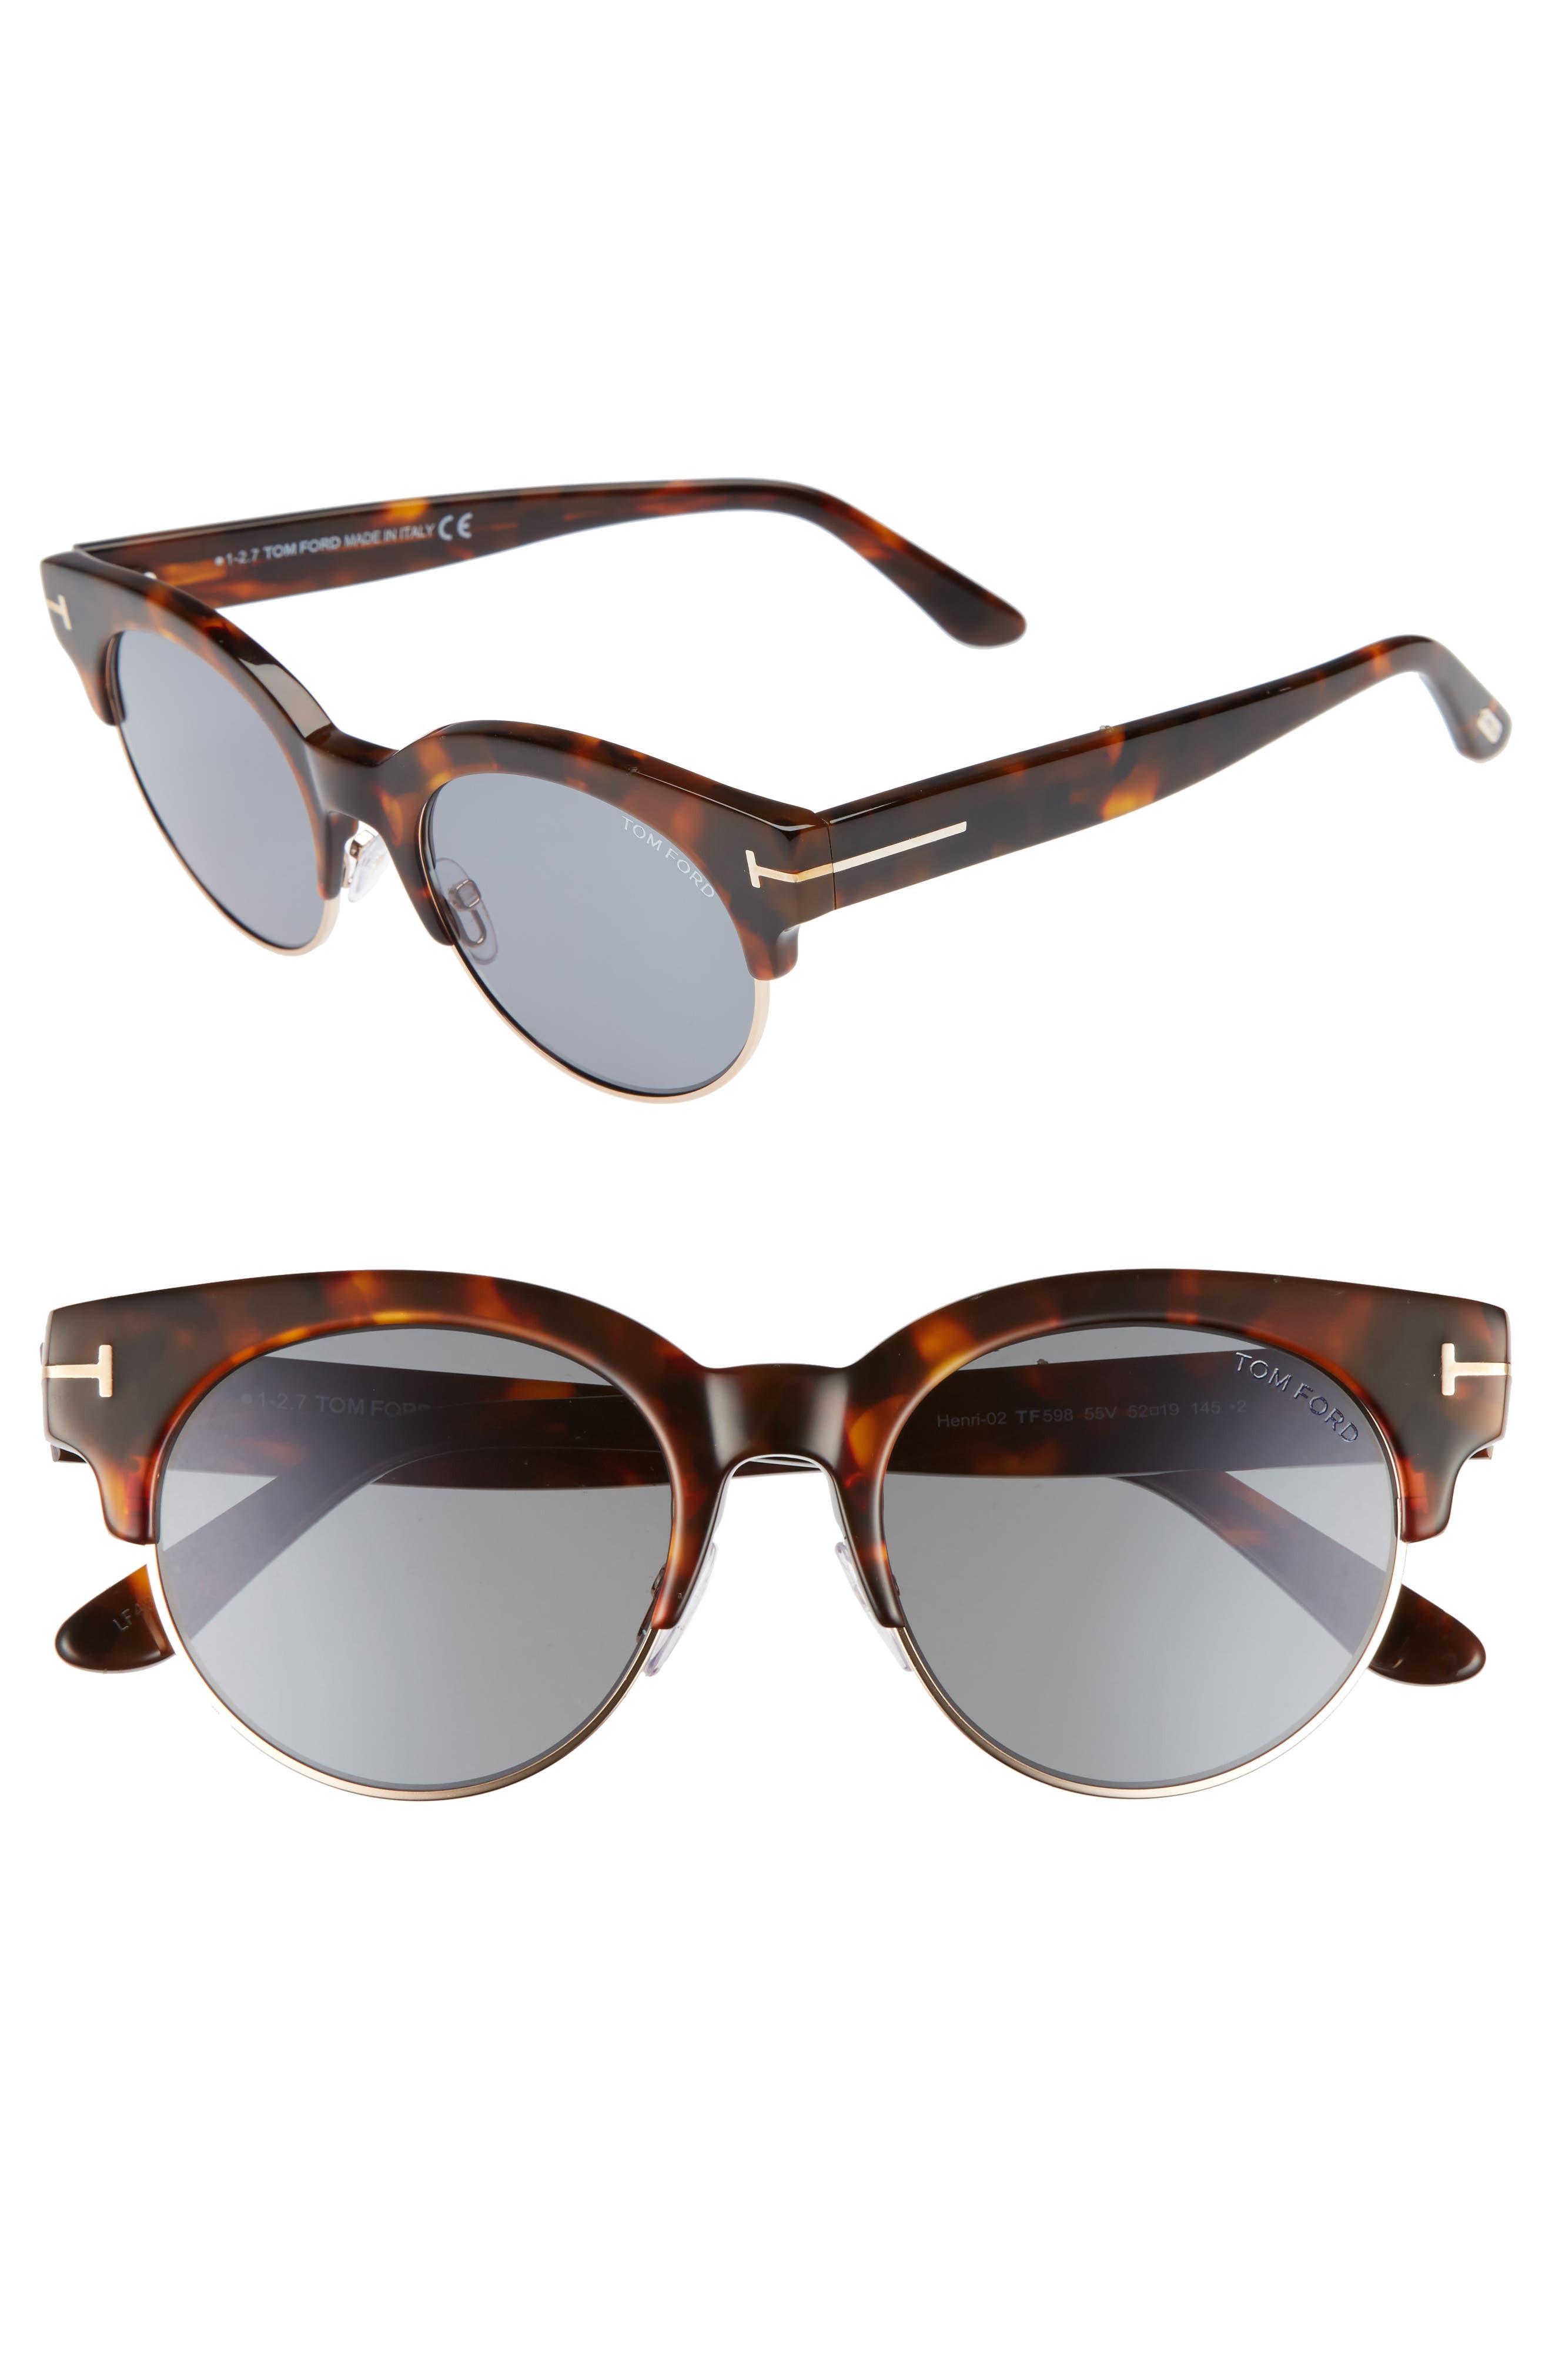 Tom Ford Henri 52mm Semi-Rimless Sunglasses